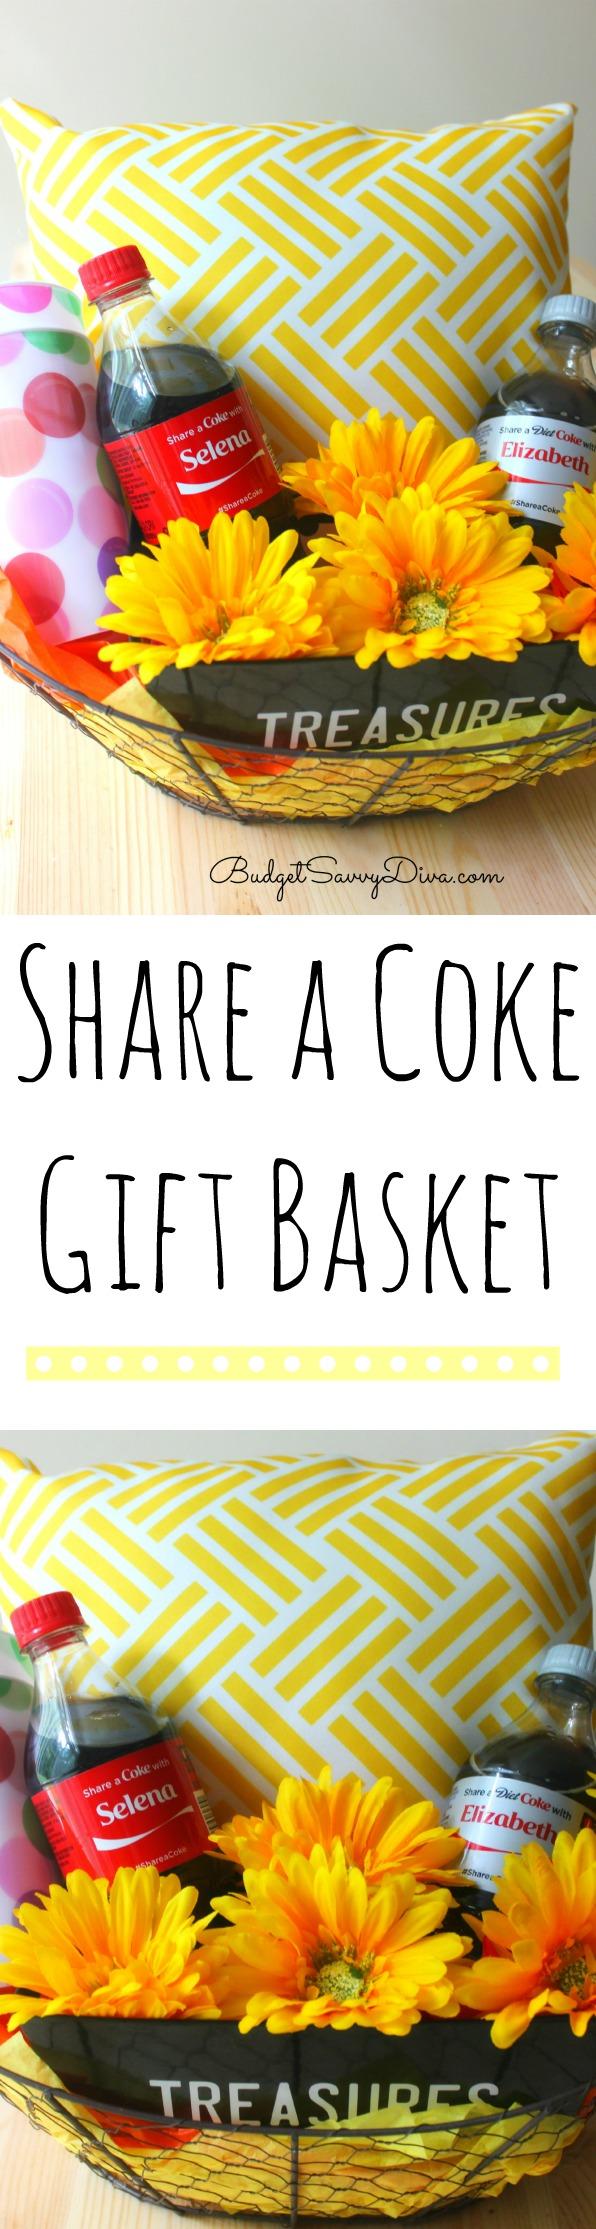 Coke Basket FINAL